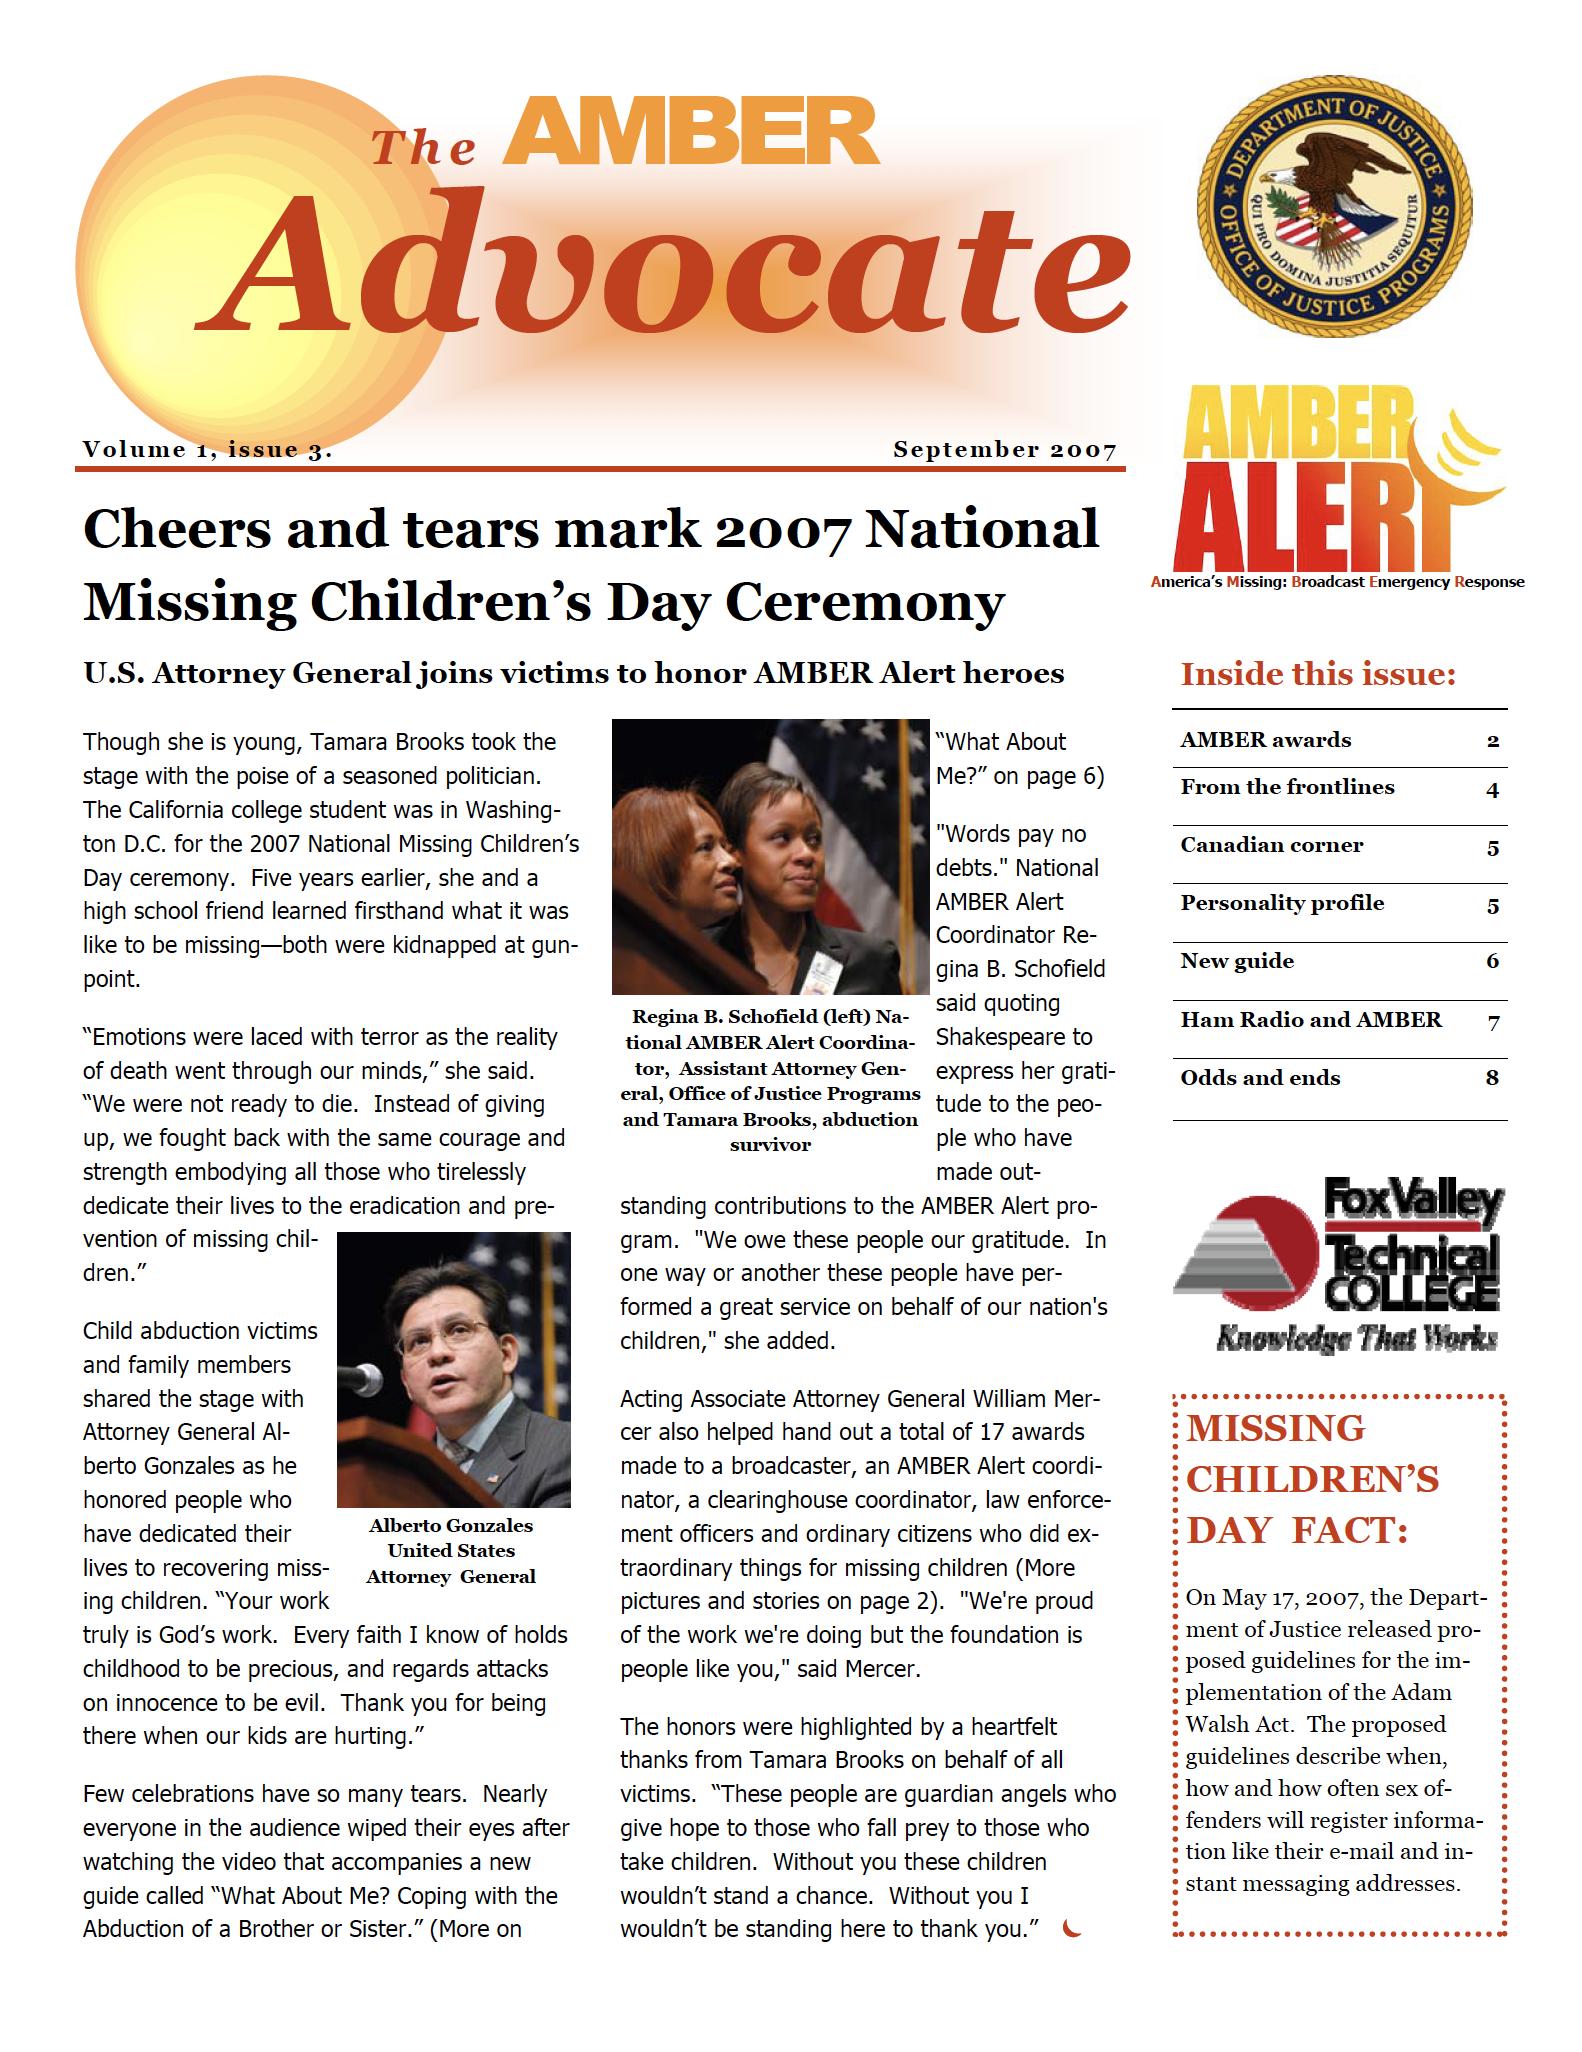 AMBER Advocate 3 cover